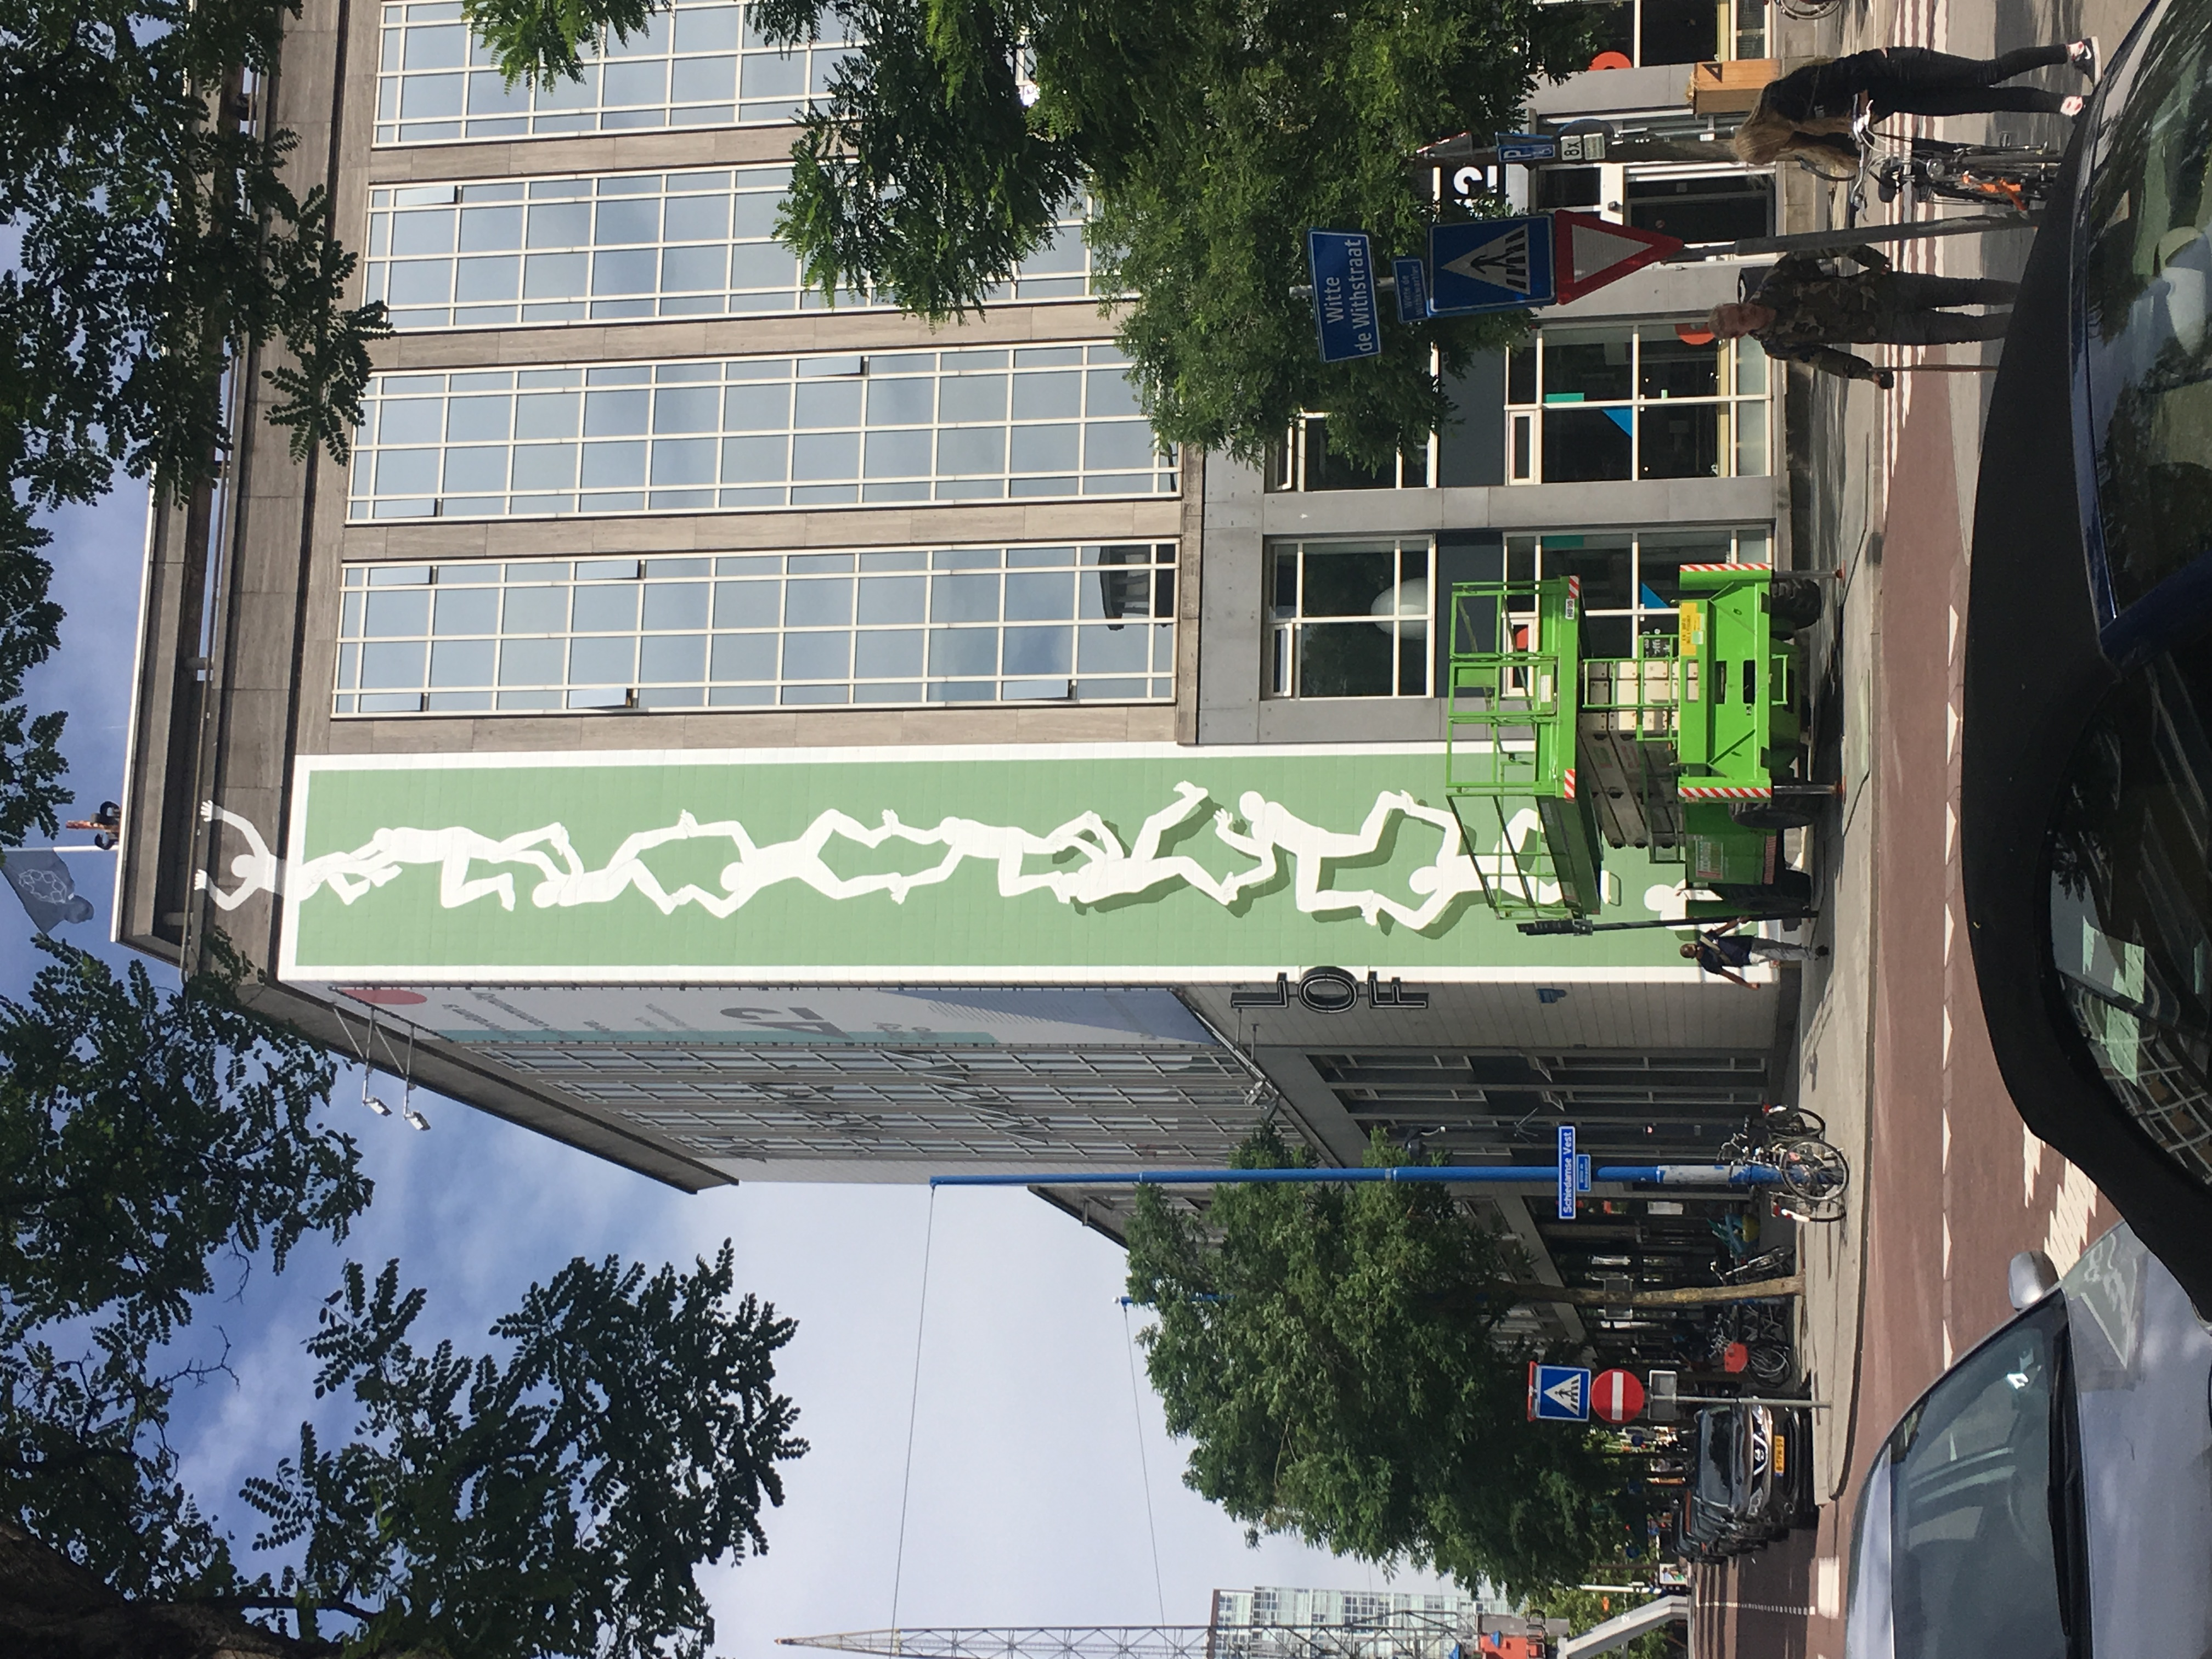 Public Art Rotterdam